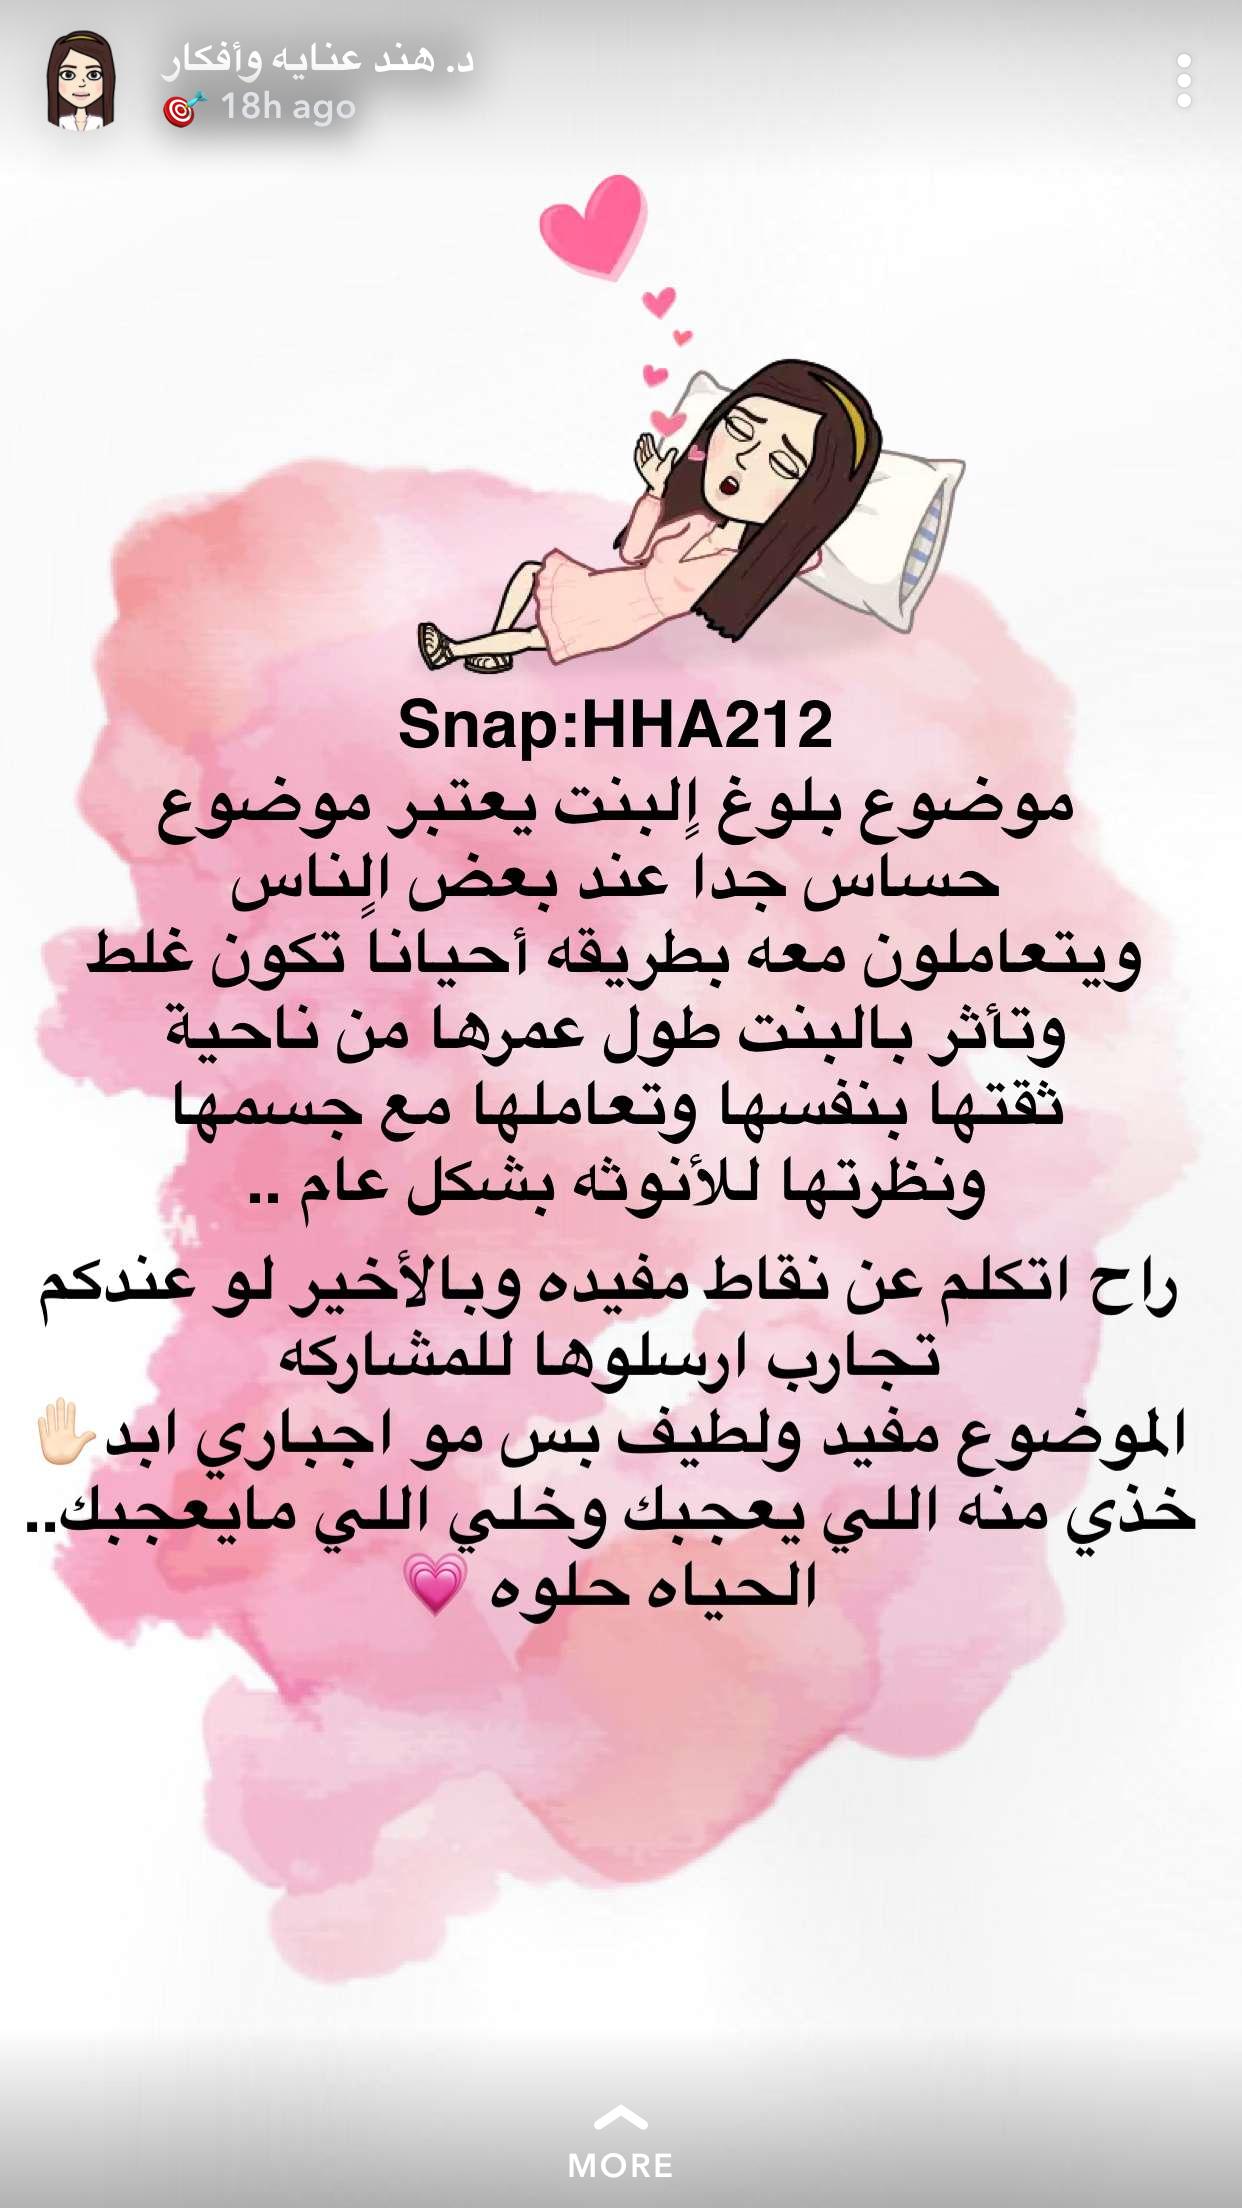 Pin By Nidal Alrashi On اتكيت التعامل مع الطفلة عند البلوغ Life Habits Life Rules Life Partners